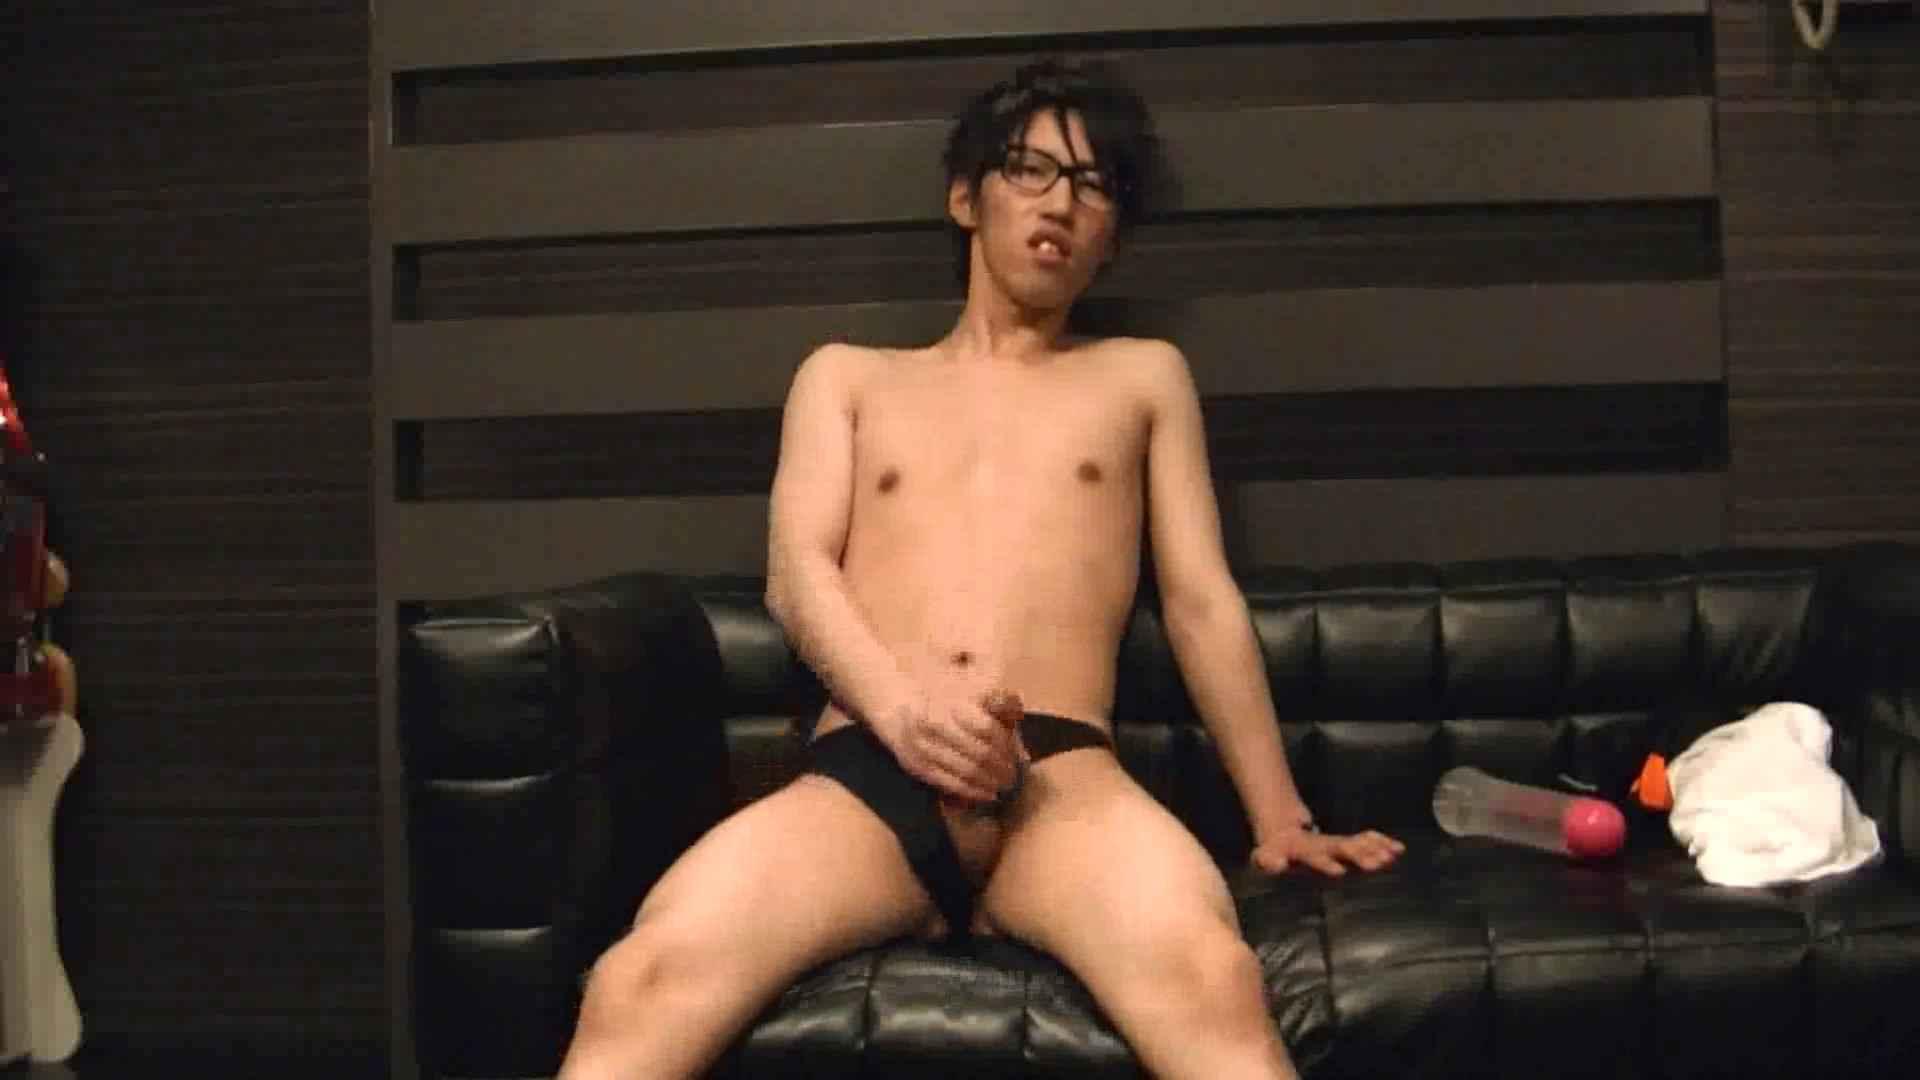 ONA見せカーニバル!! Vol3 男 ゲイ無料無修正画像 89枚 86